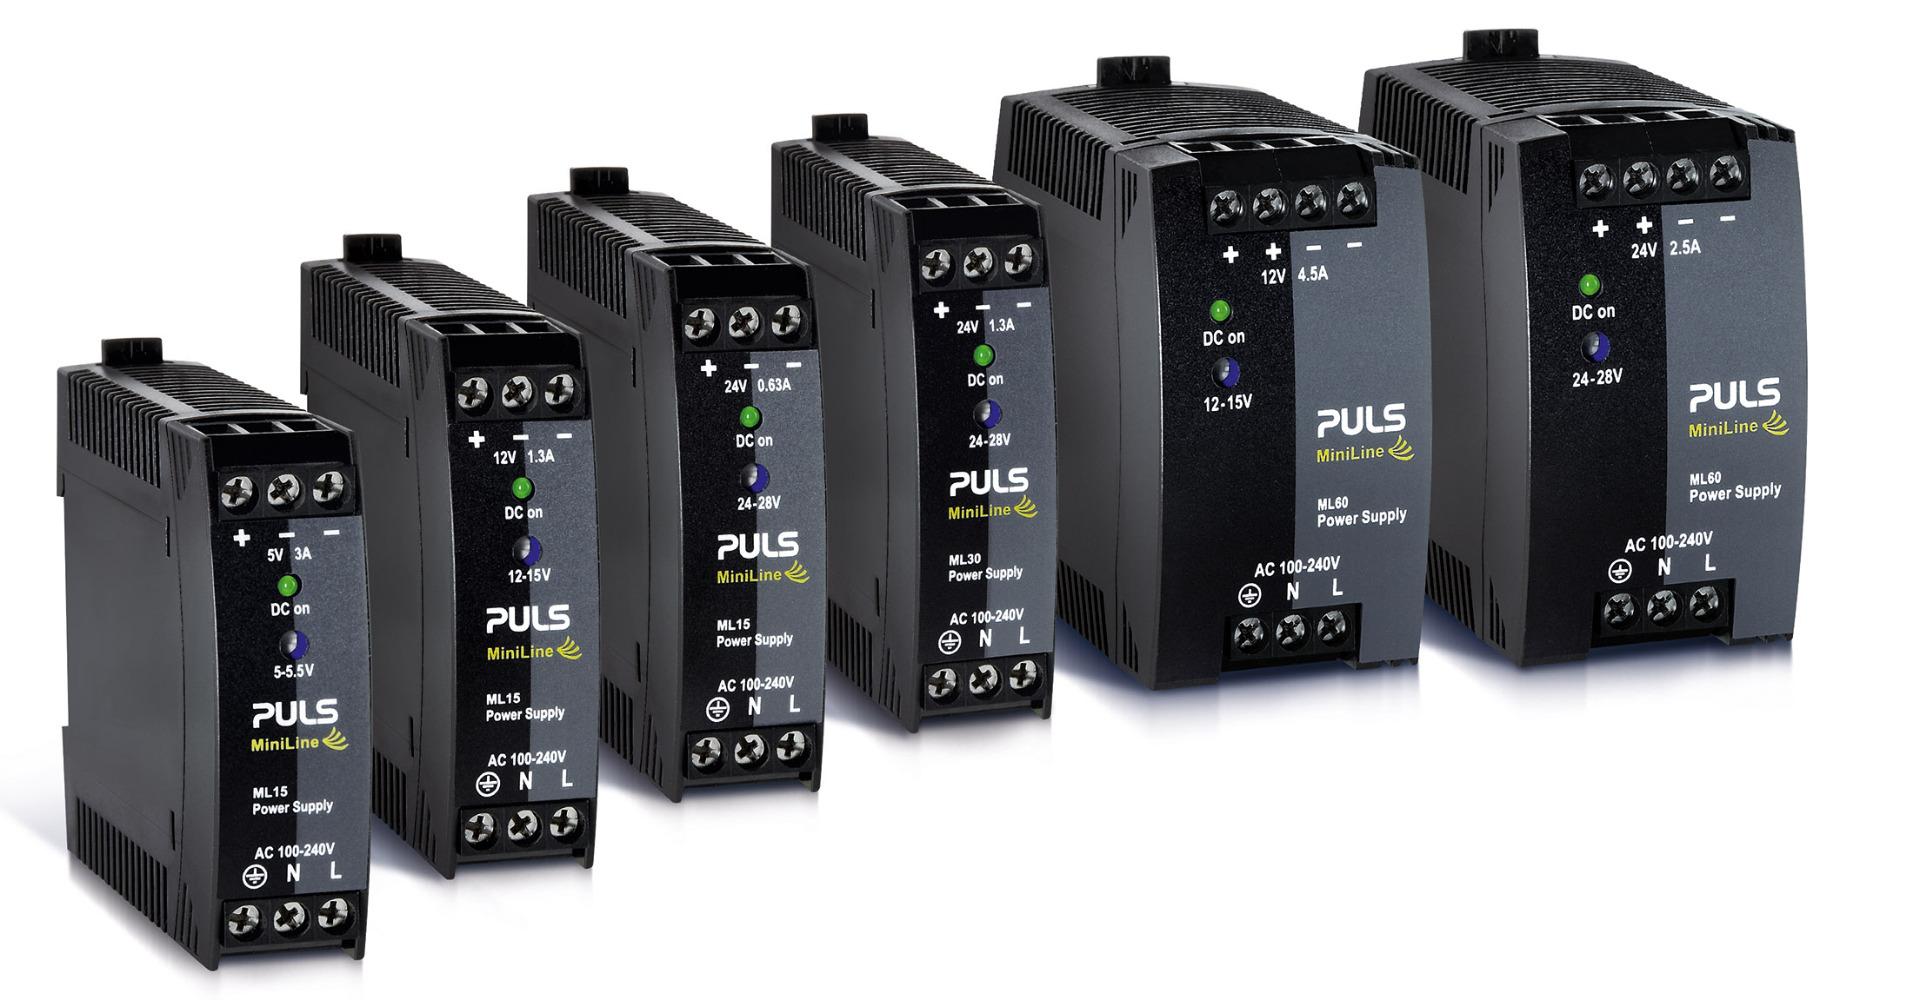 MiniLine DIN rail power supply product family